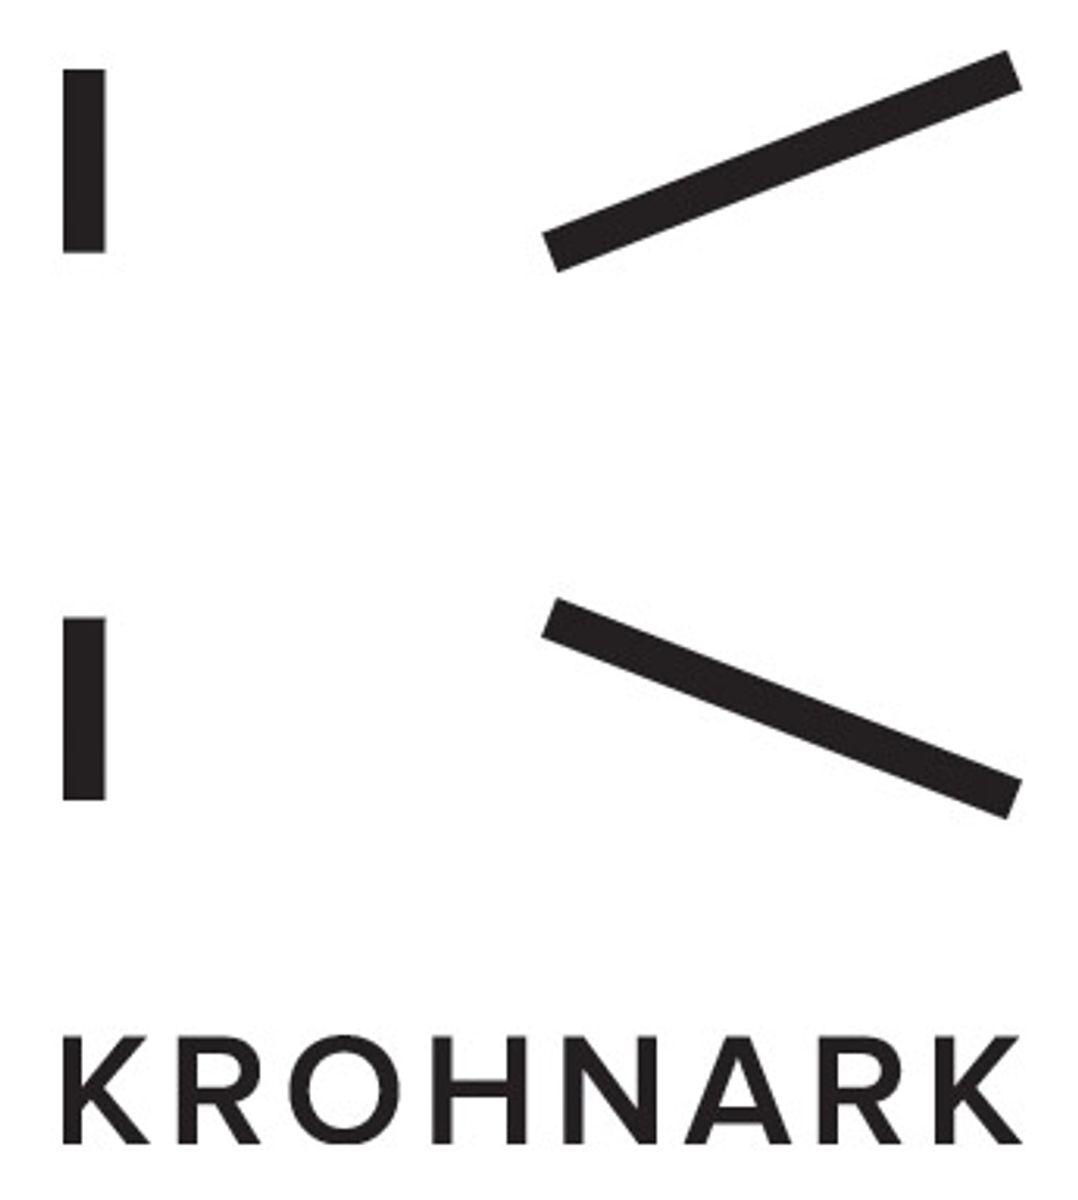 Krohnark